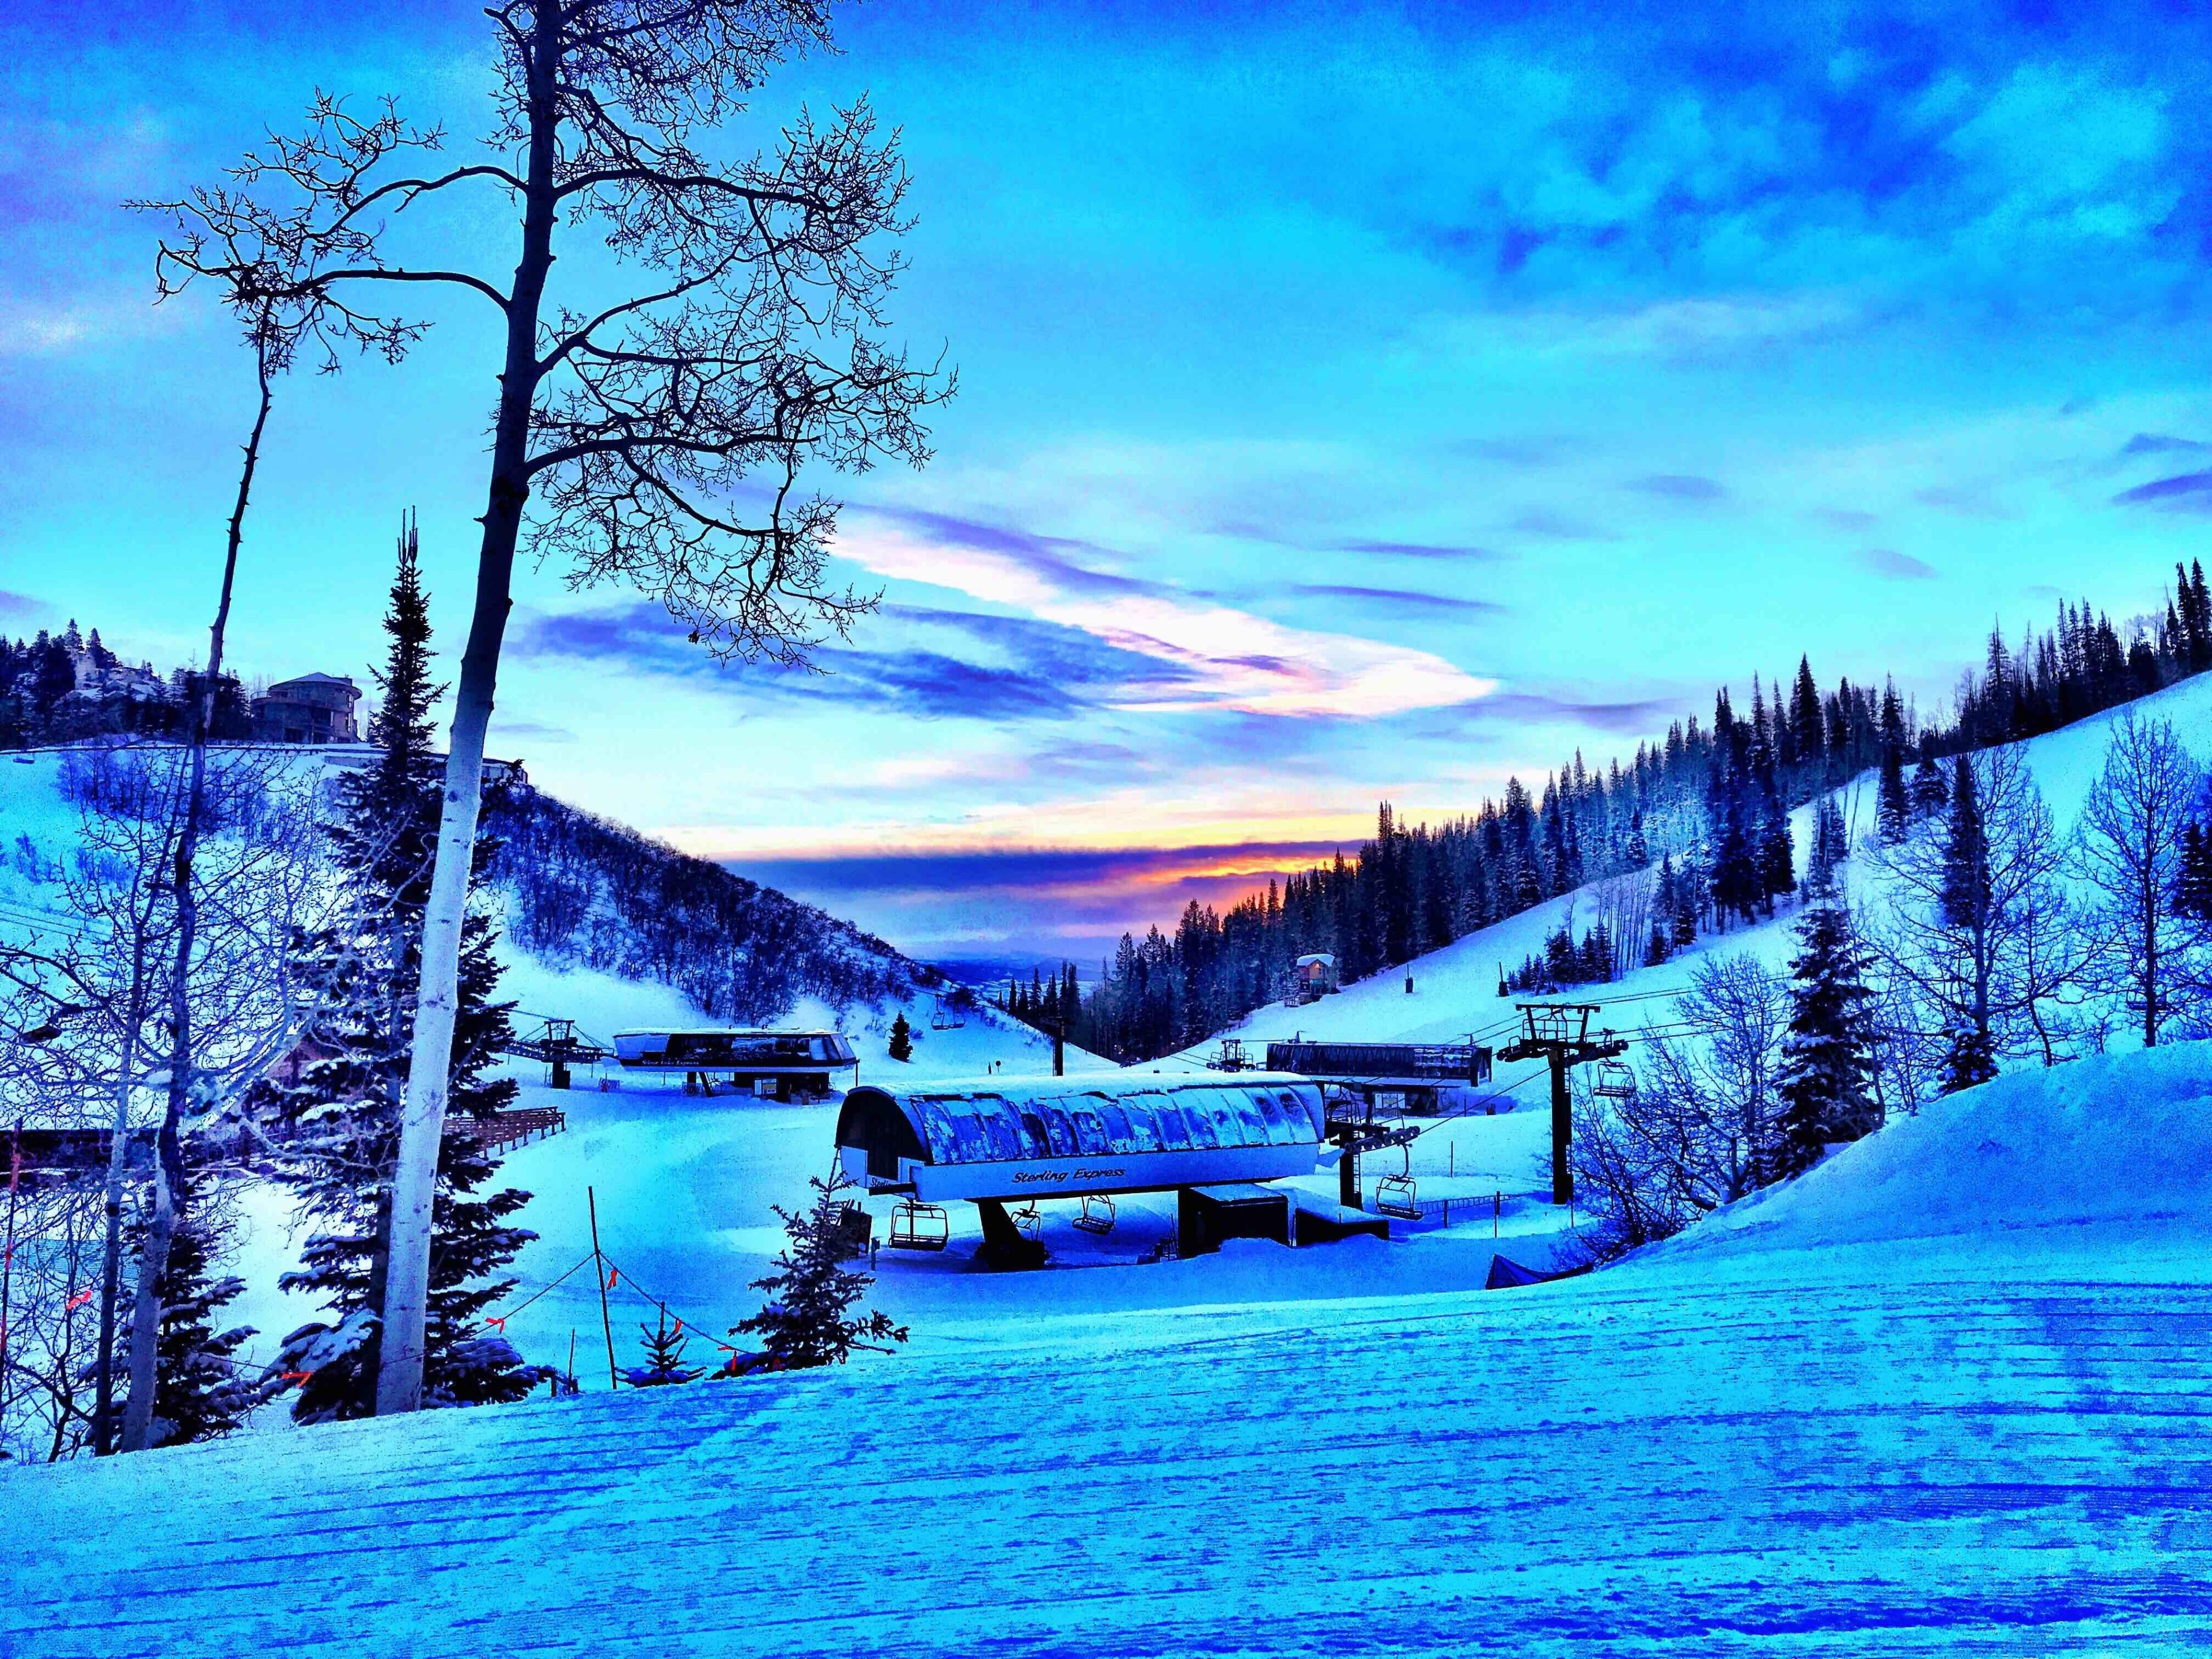 Silver Lake Village, Park City, Utah, United States of America